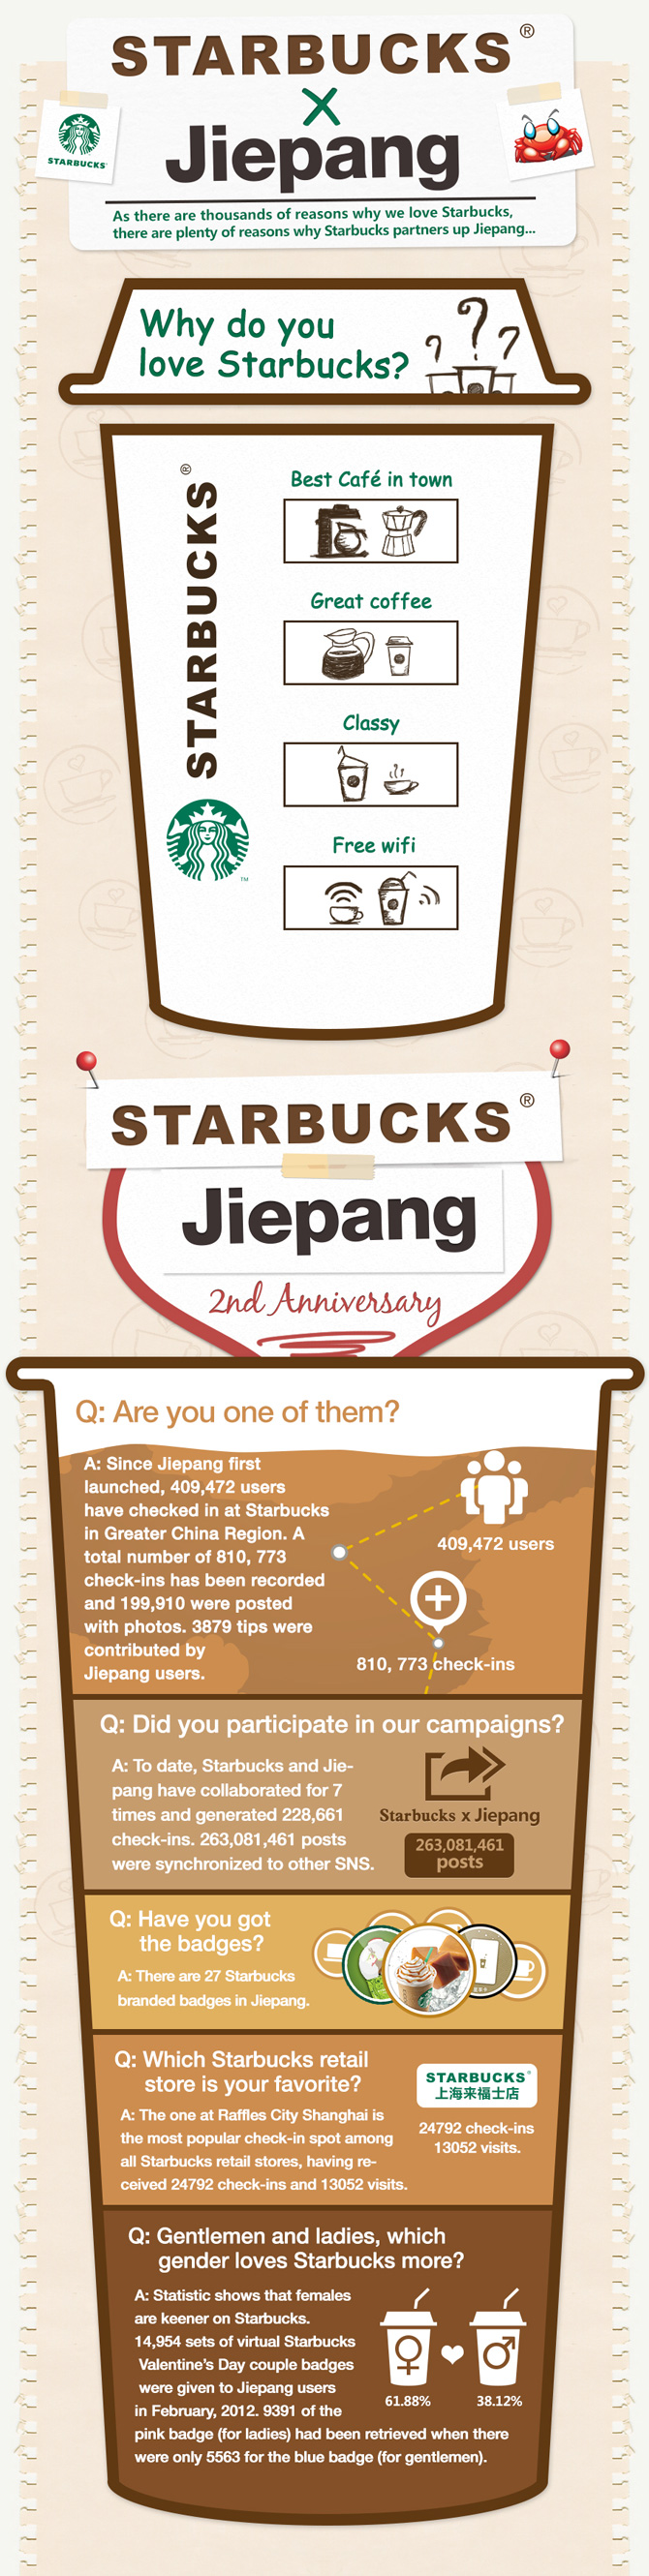 Infographic-jiepang-starbucks